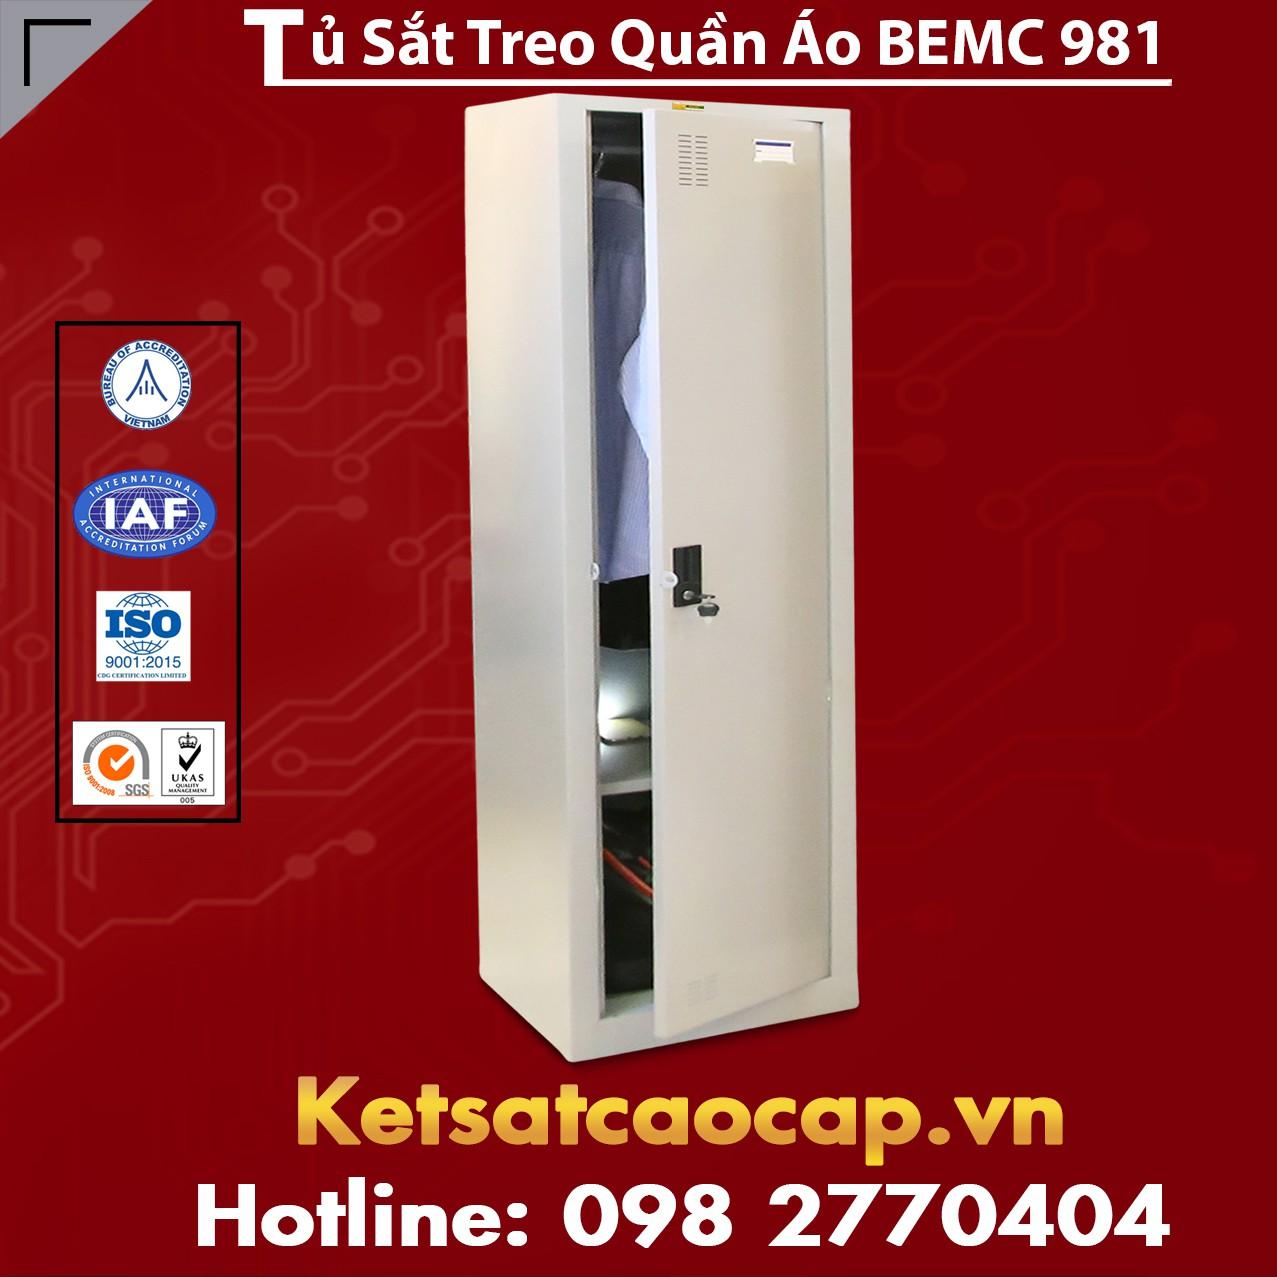 Tủ Sắt Treo Quần Áo BEMC 981